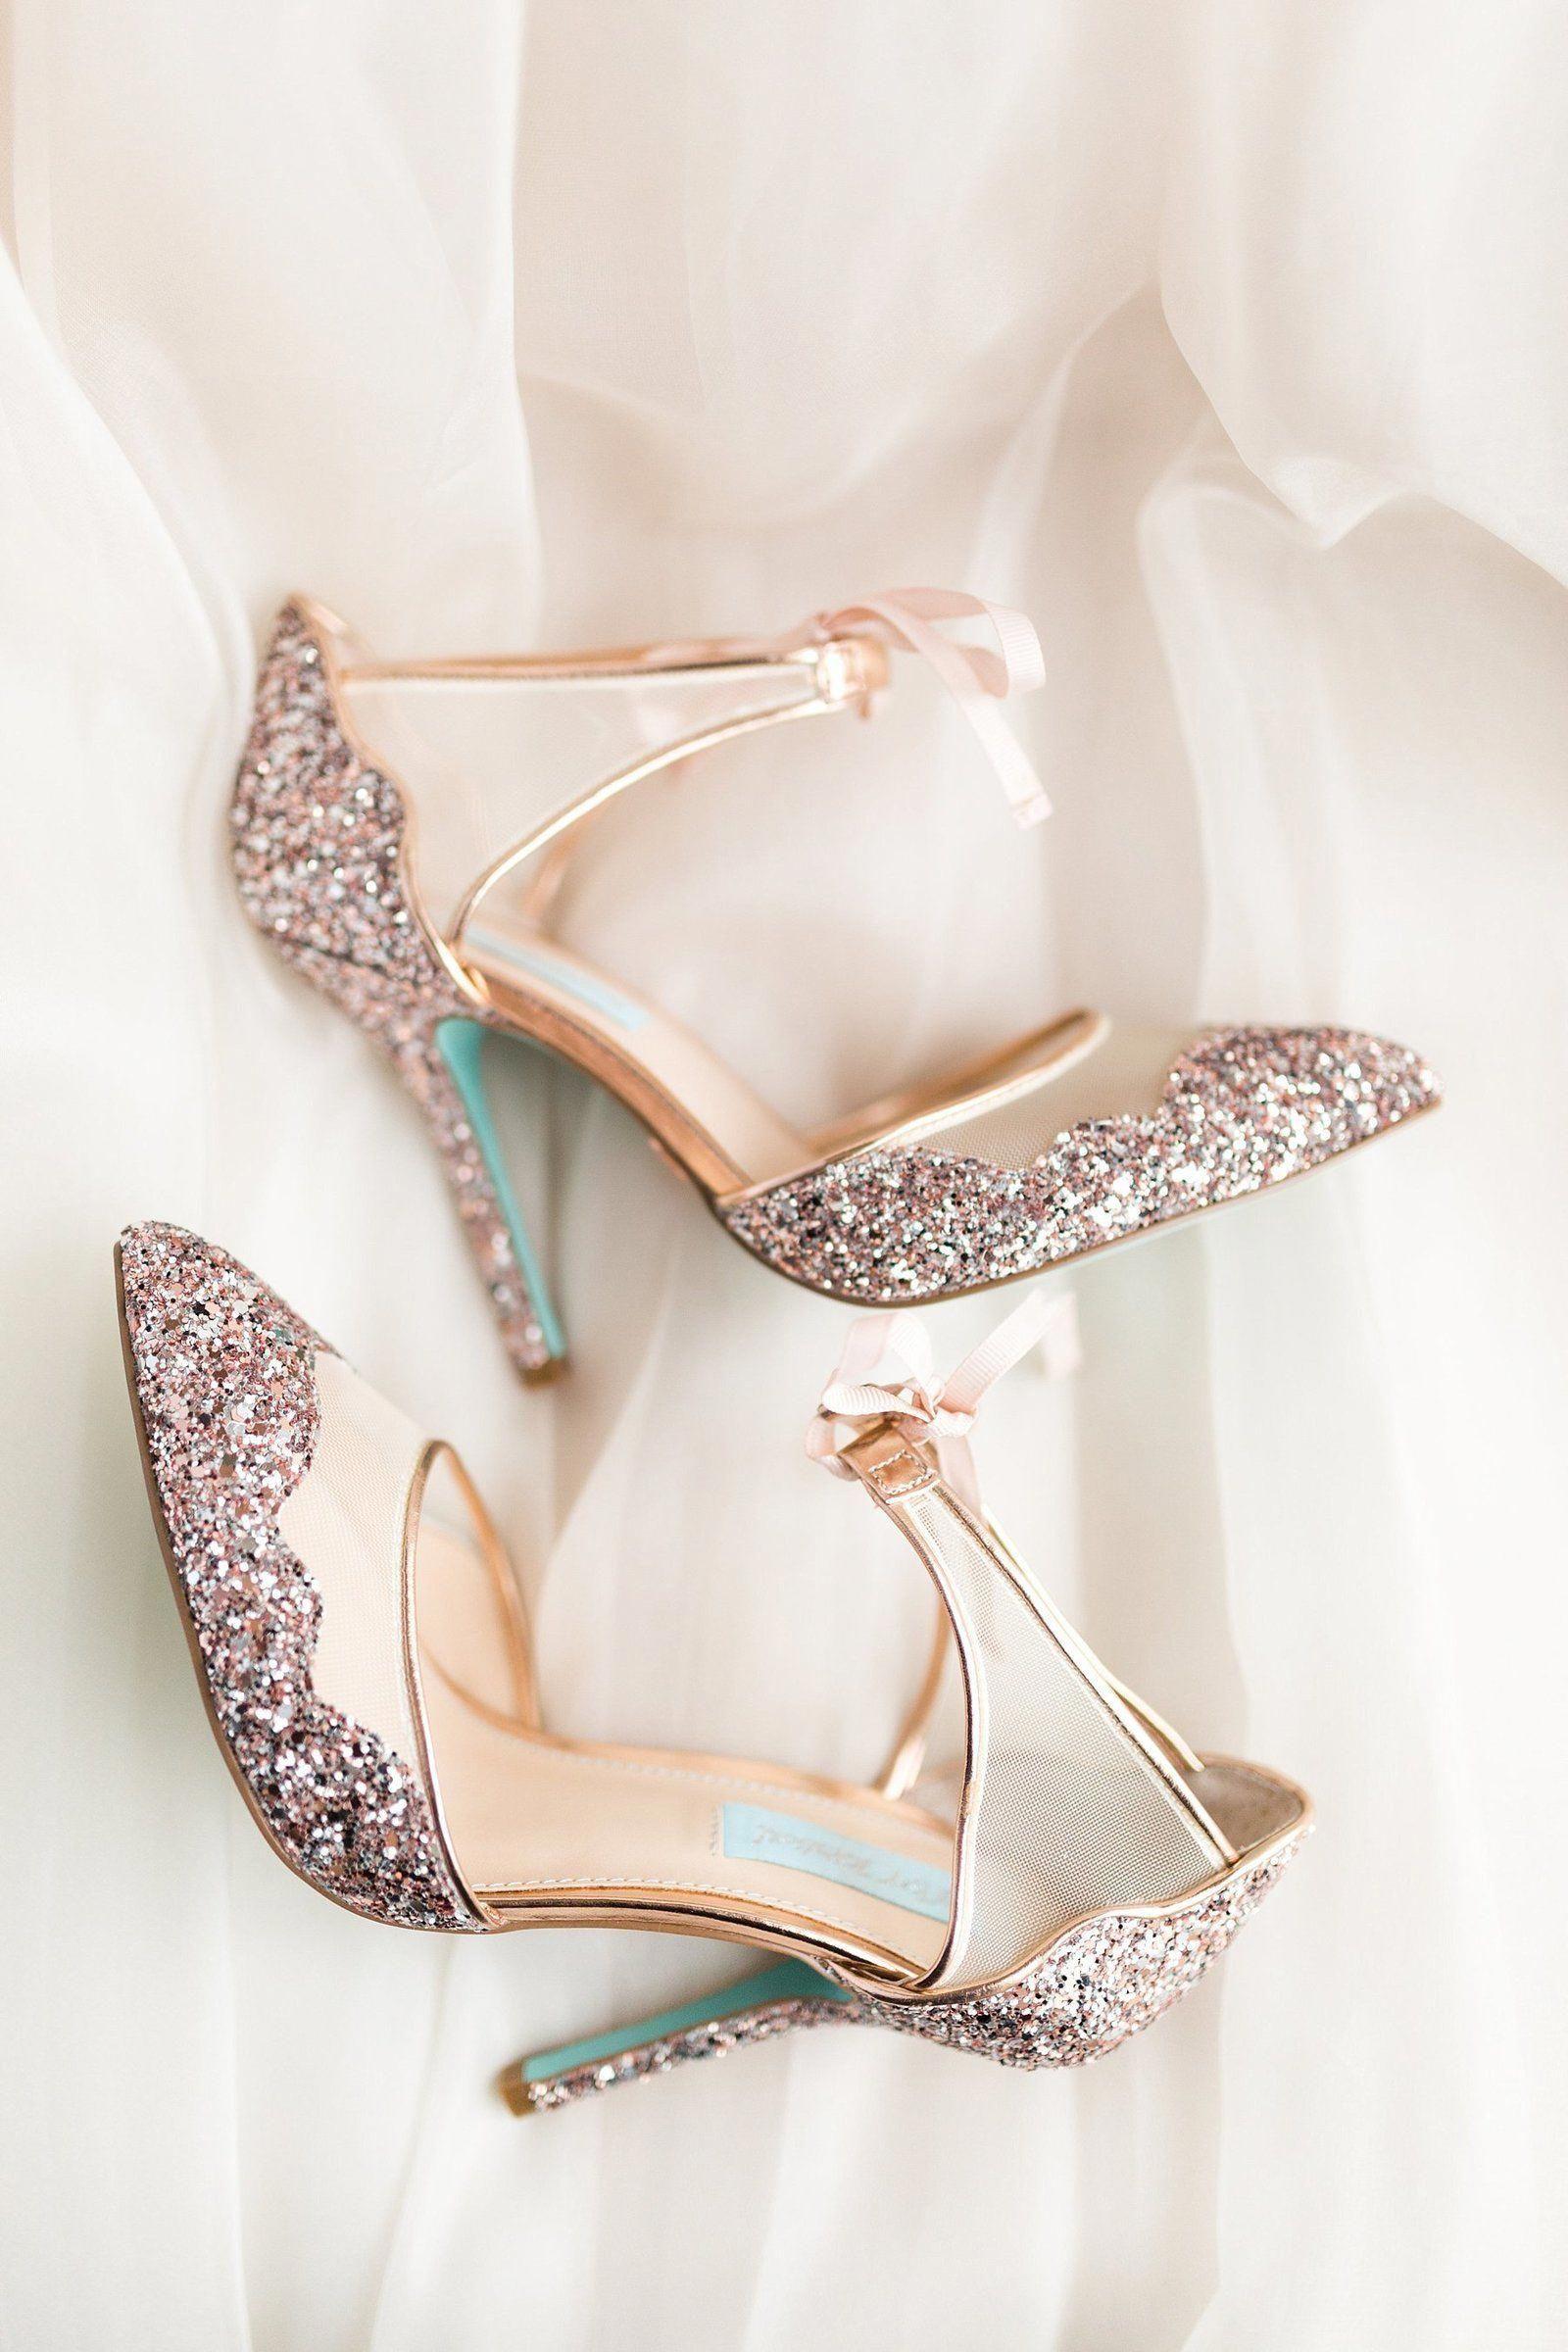 Hoka Women S Shoes Review Keenwomensshoesdiscount Discountlifestridewomensshoes Wedding Shoes Brides Heels Bohemian Wedding Shoes Disney Wedding Shoes